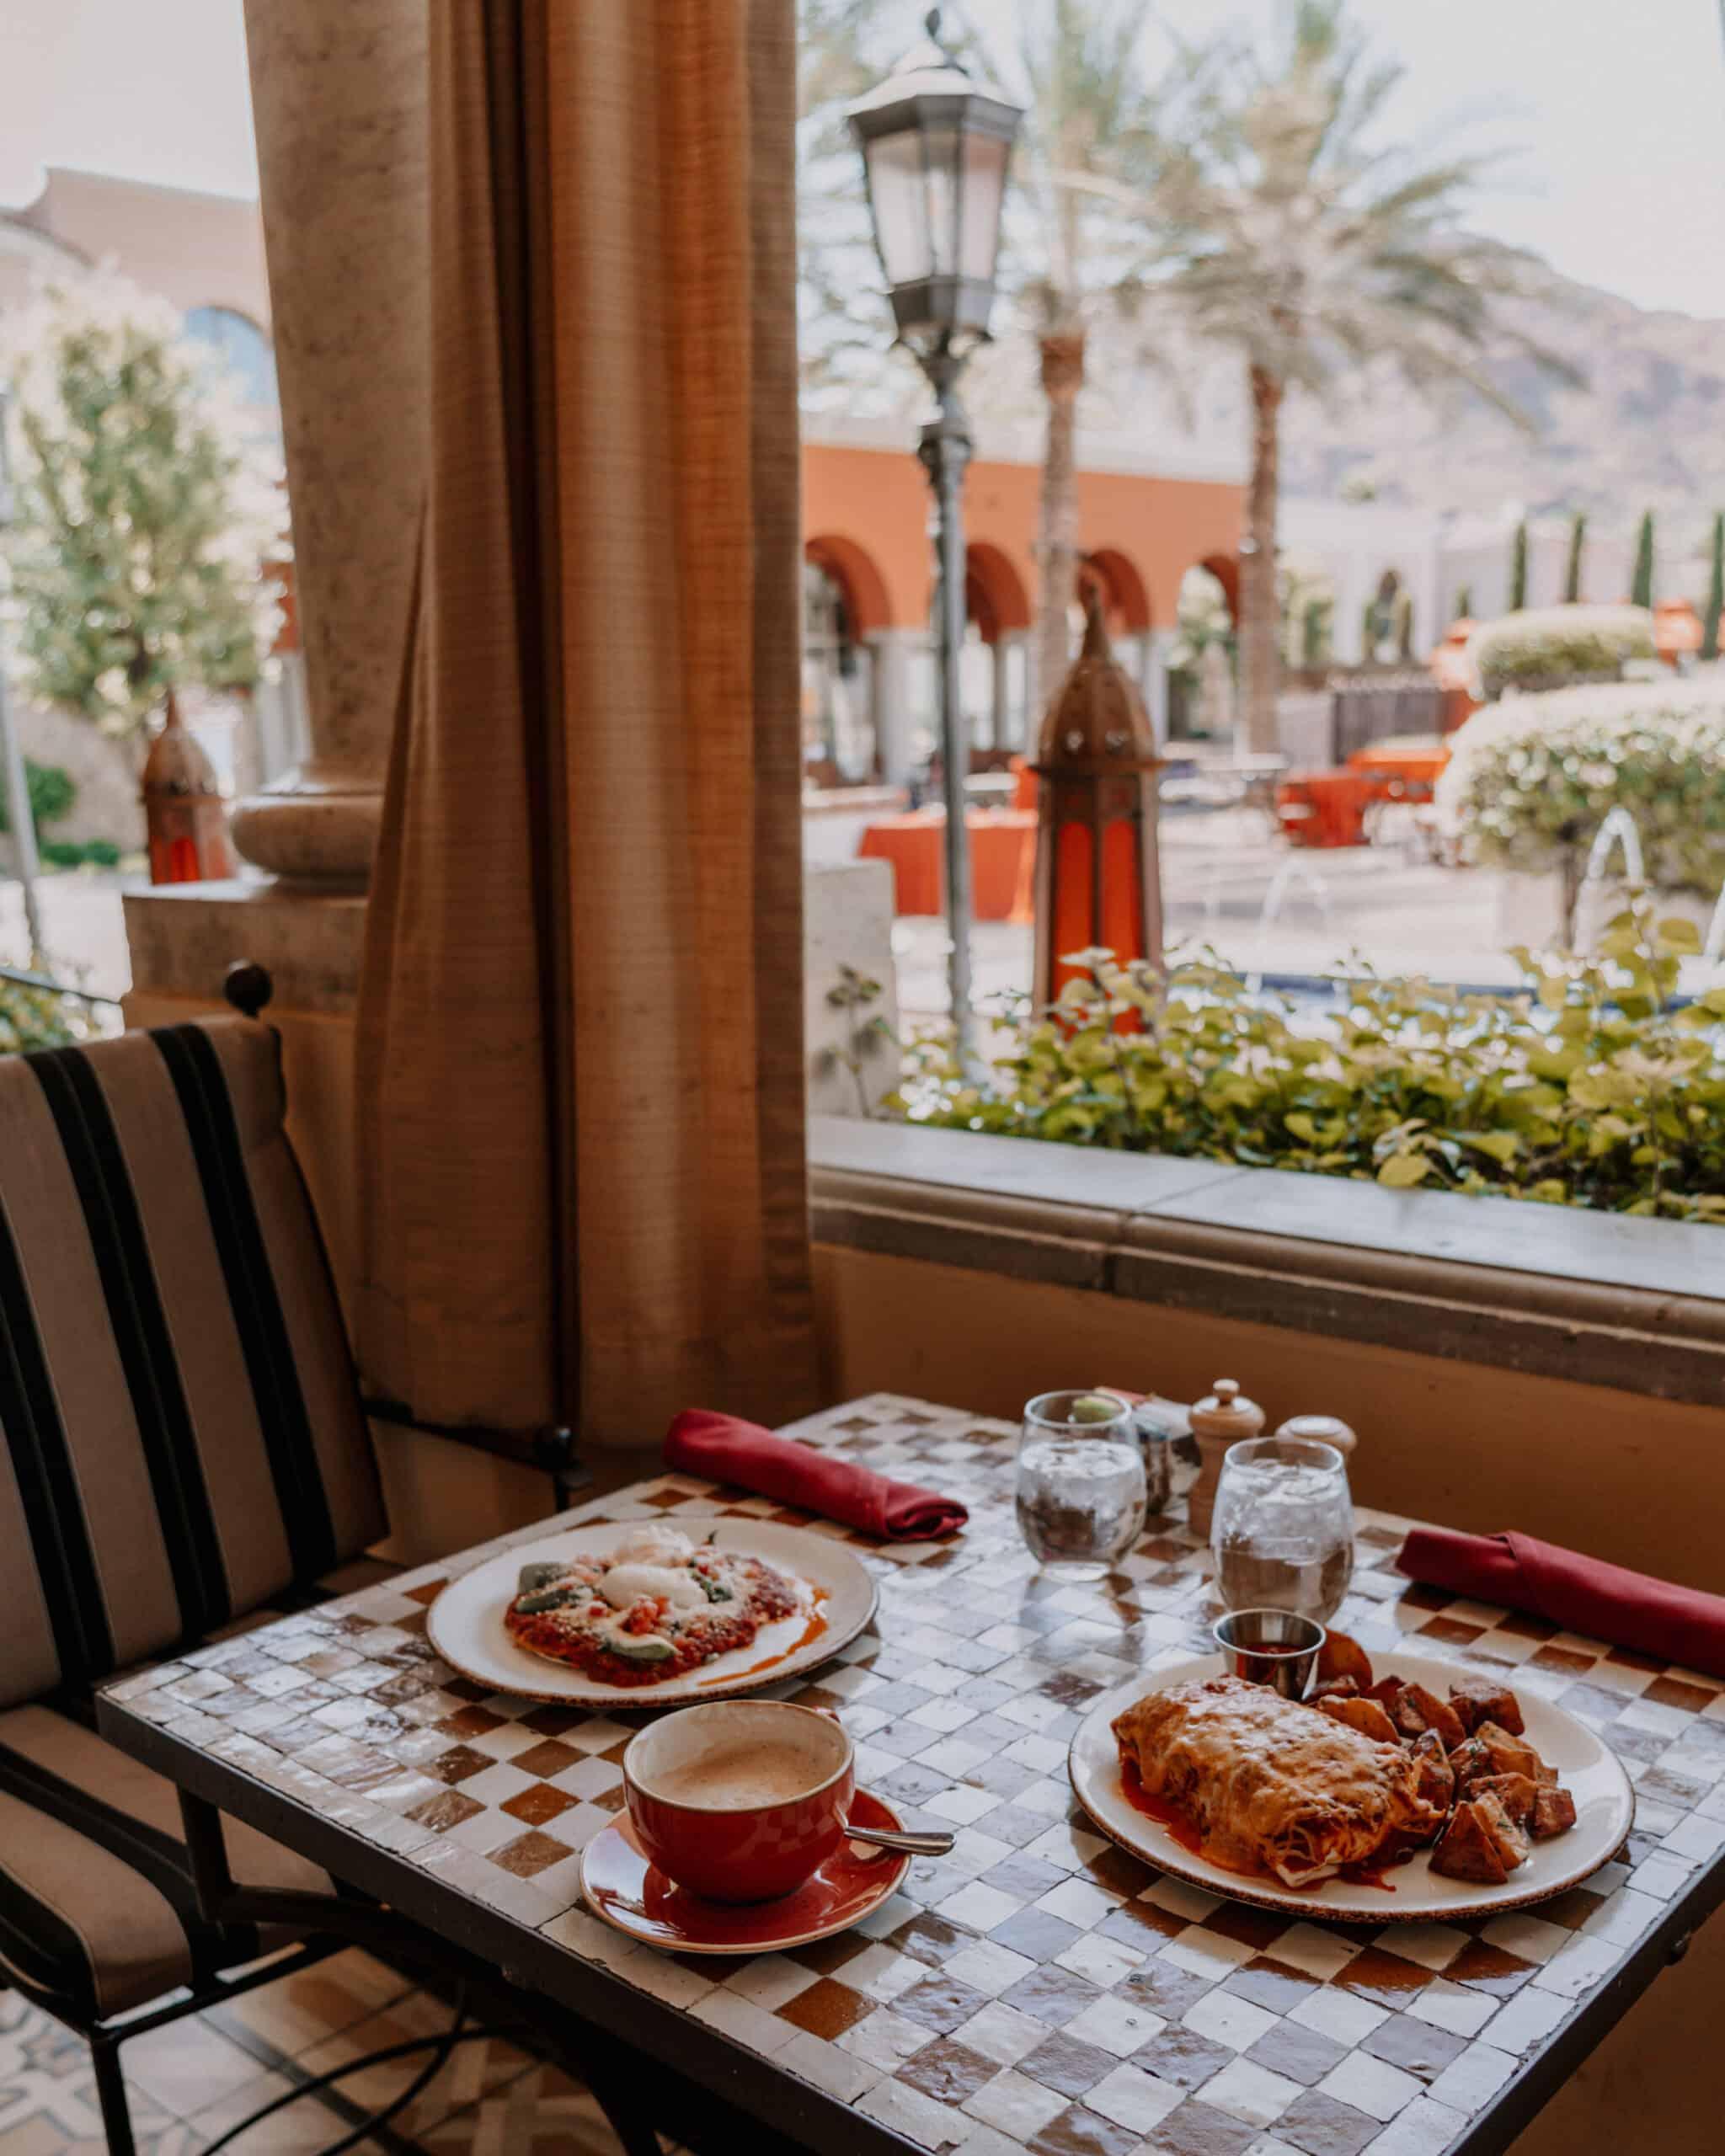 Breakfast at Prado at the Omni